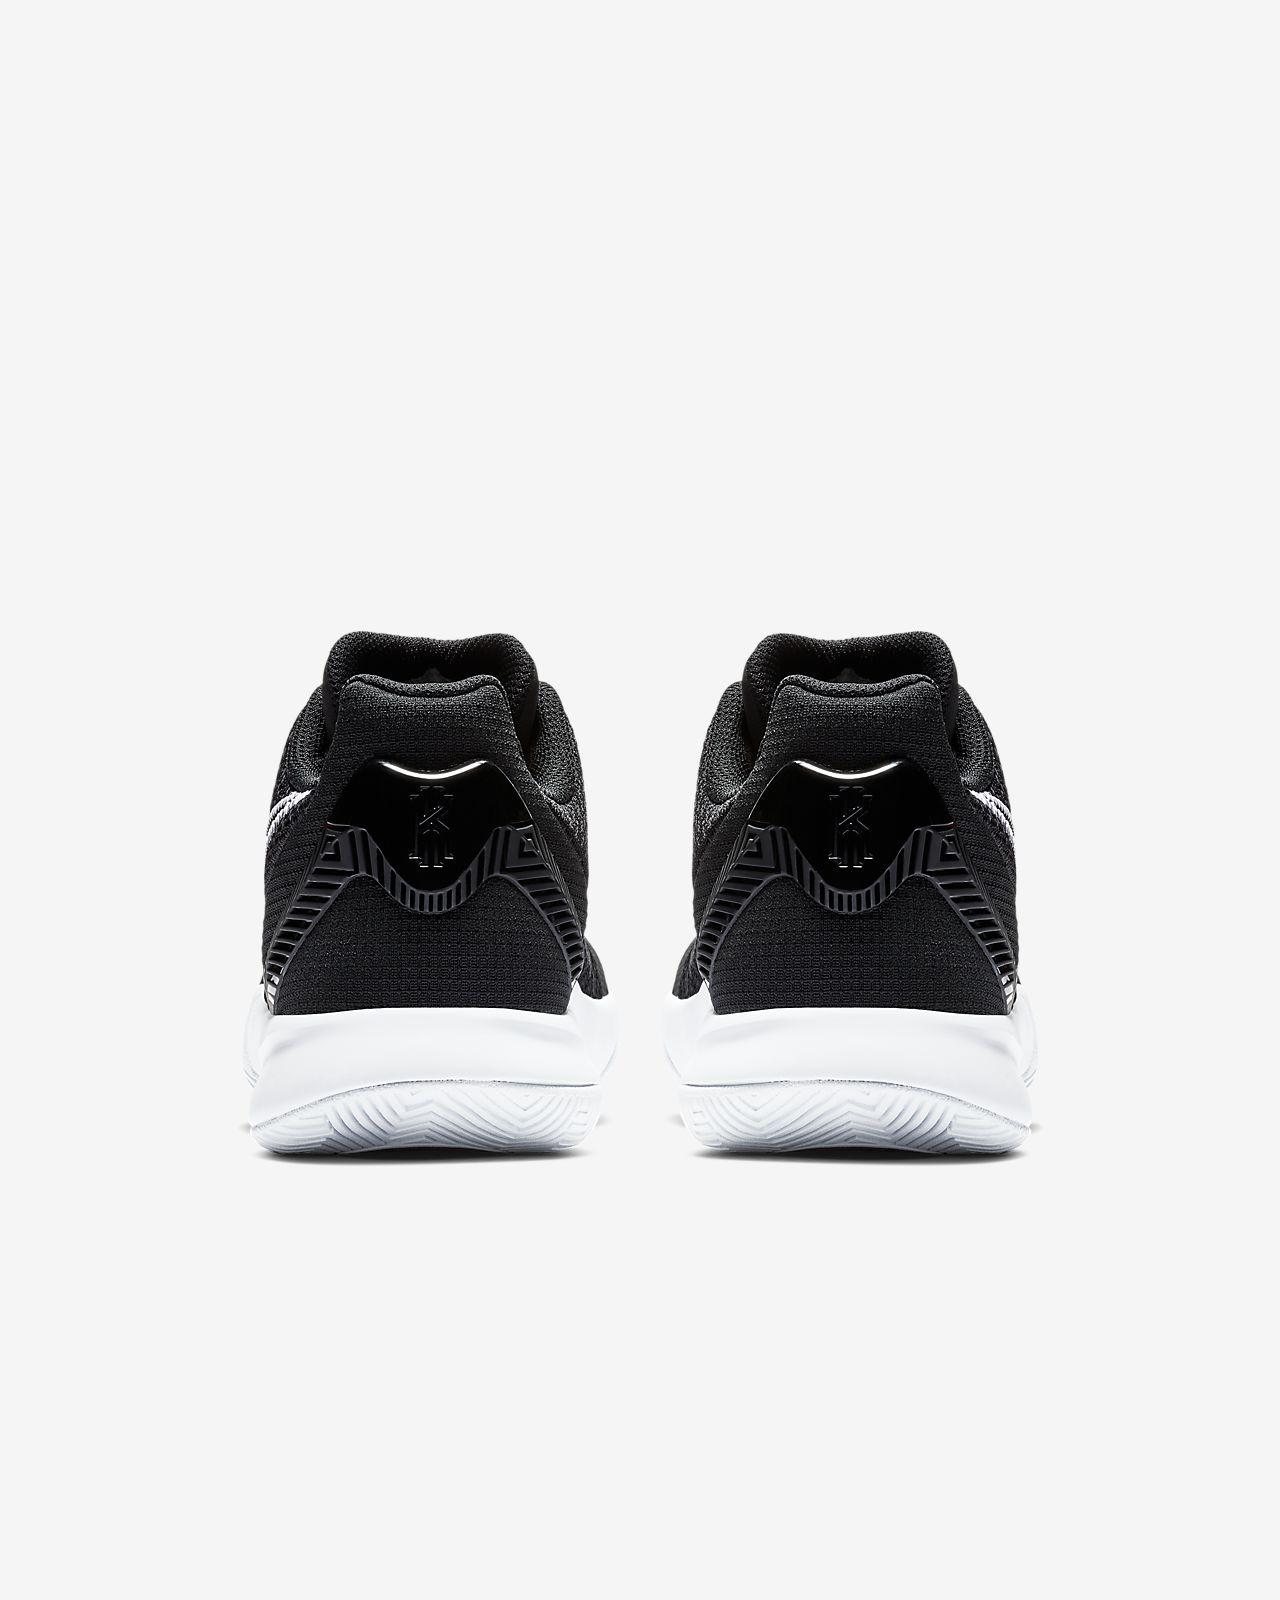 938a3b6480c Kyrie Flytrap II Basketball Shoe. Nike.com CA